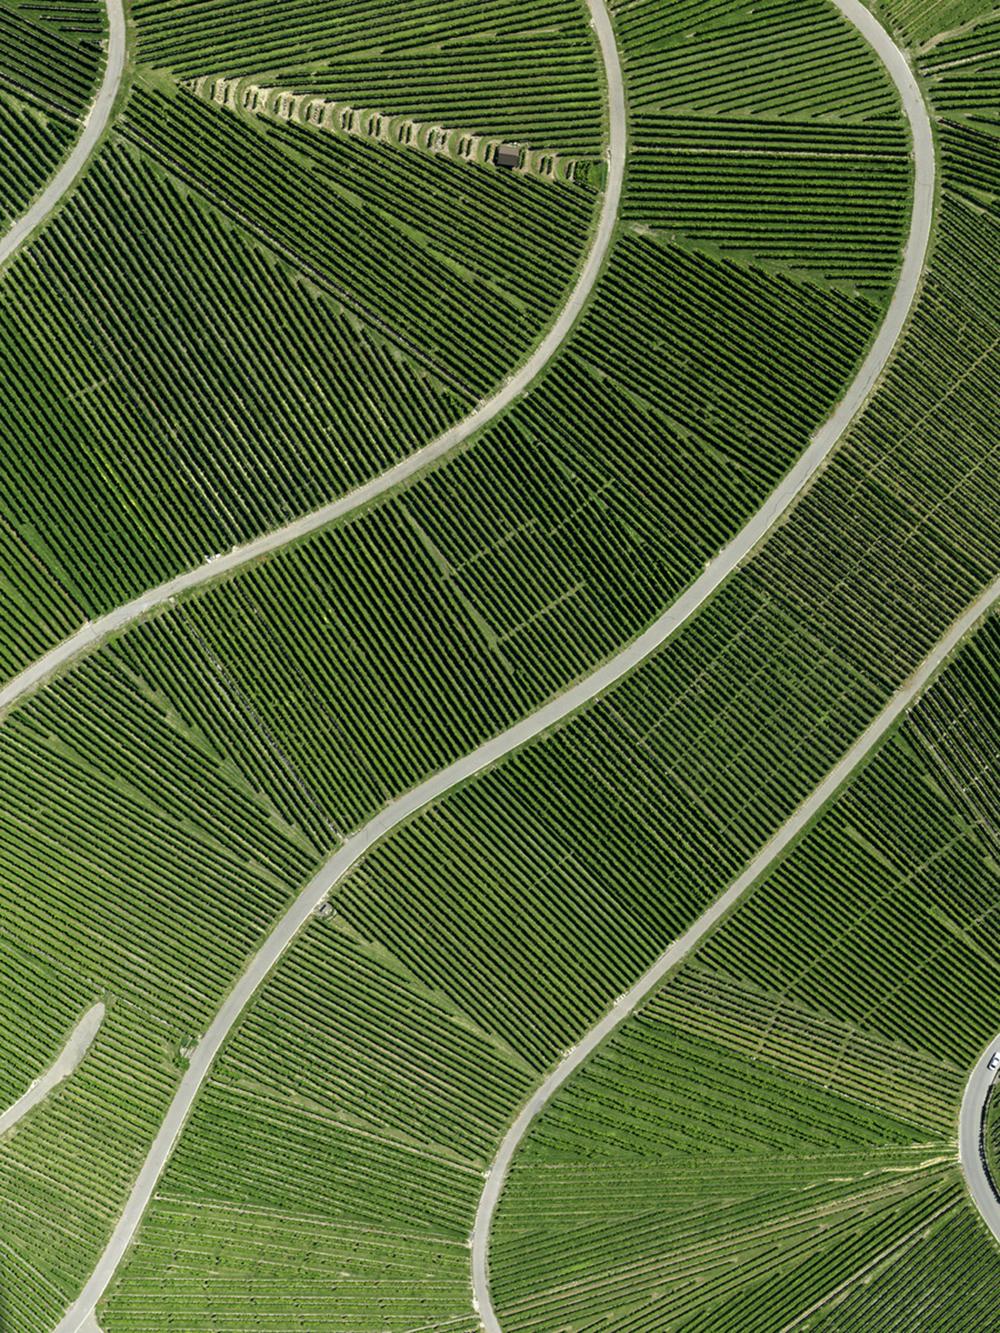 Vineyard Grün (Field 03 - Cultured Land) - Stephan Zirwes